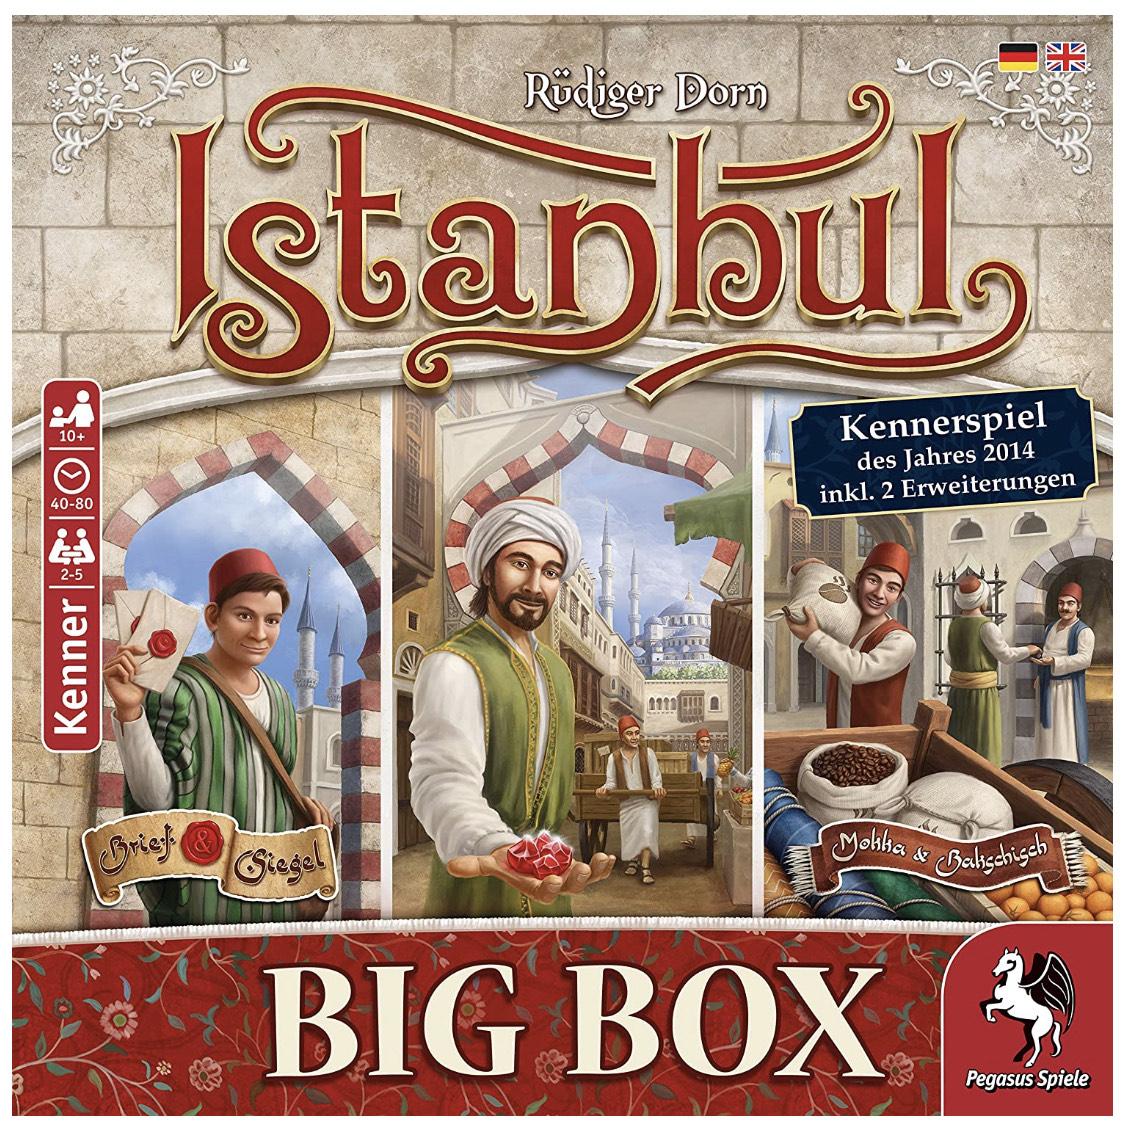 [Thalia Kult] Pegasus Spiele 55119G: Istanbul Big Box (Rüdiger Dorn, Kennerspiel des Jahres 2014, BGG 7.6)